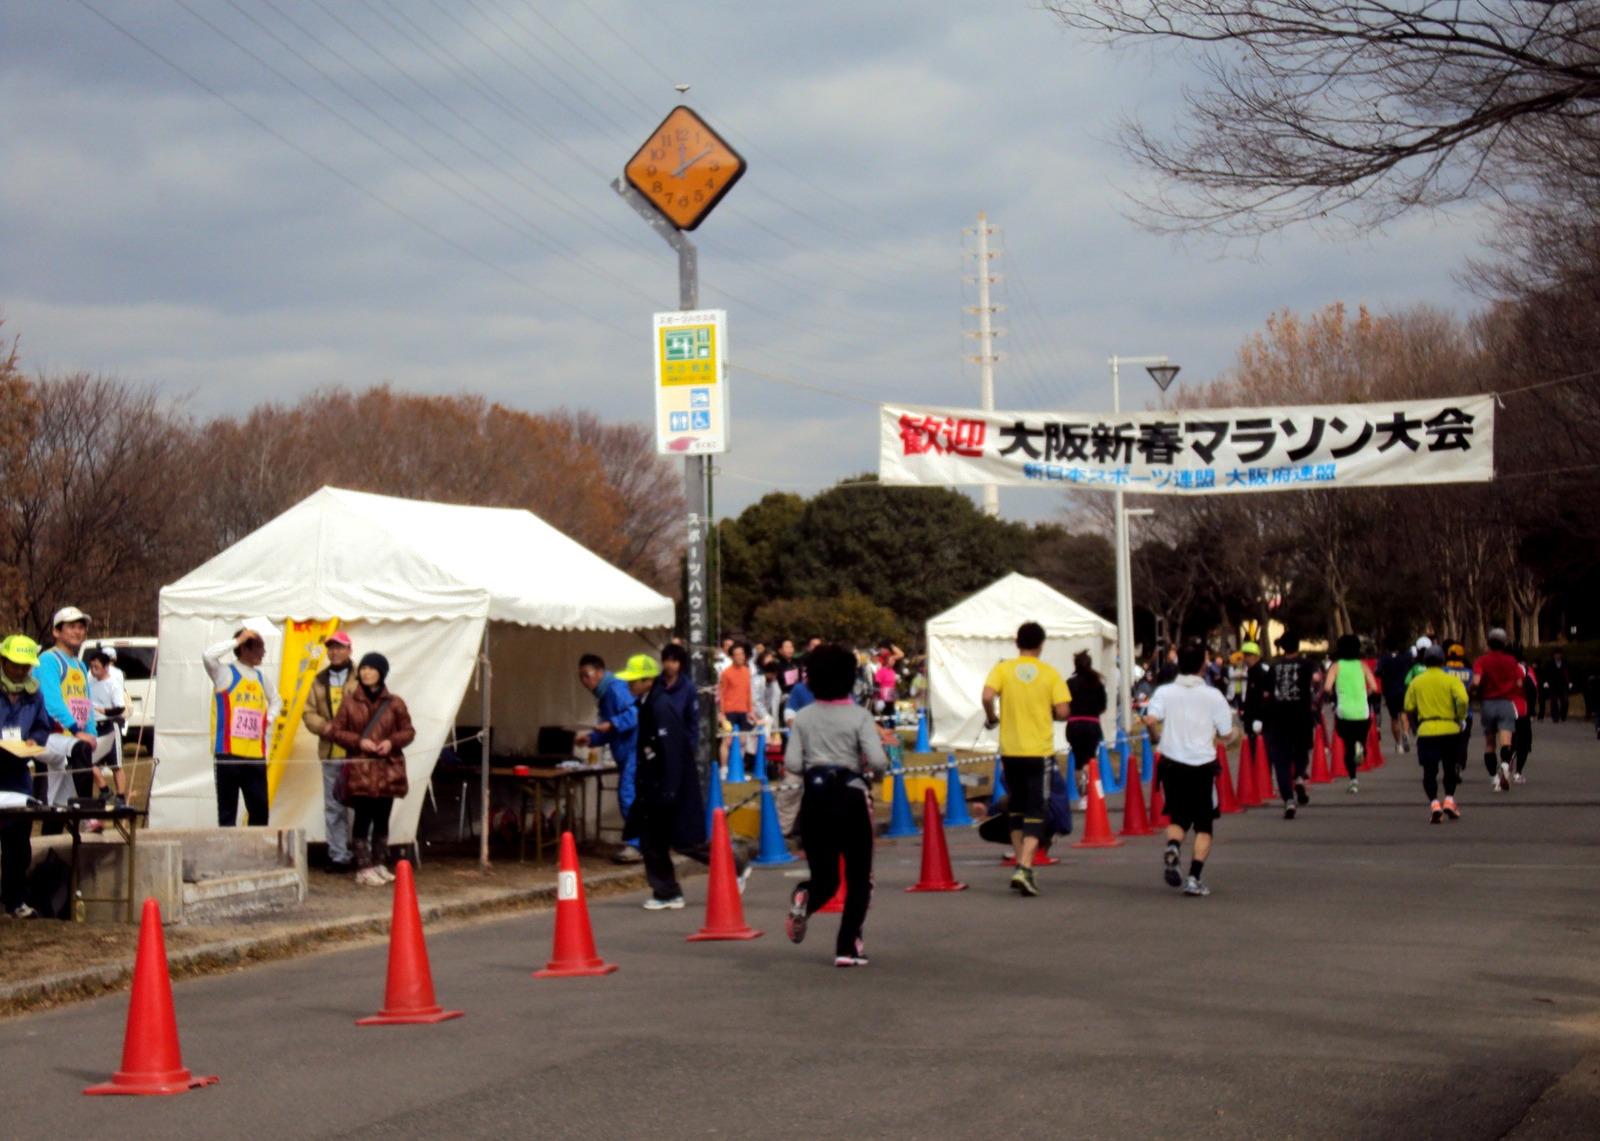 Shinsyunmarathon